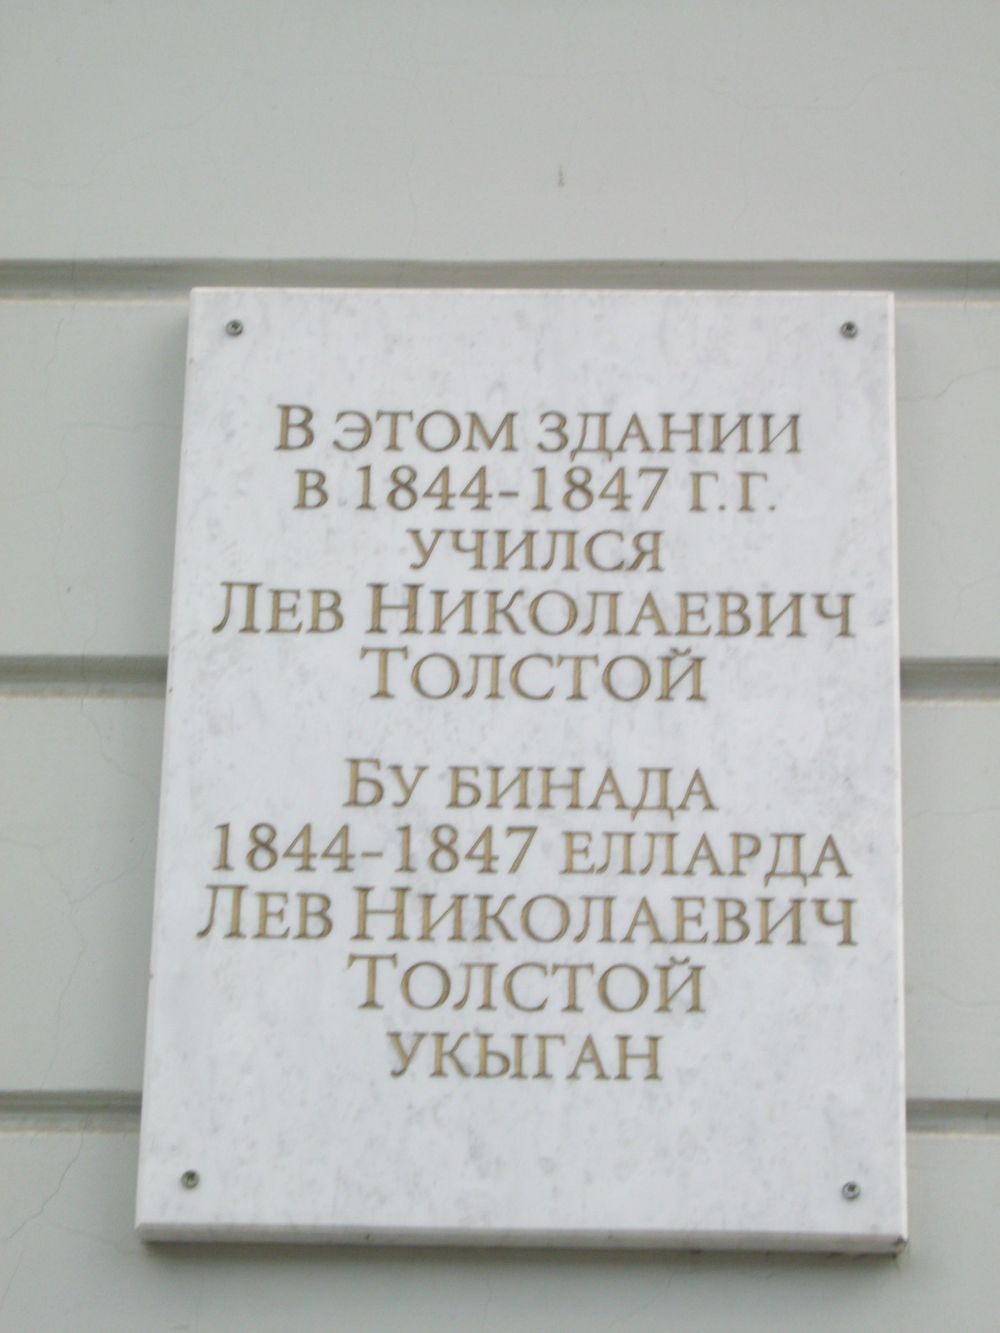 Веселый татарский язык)